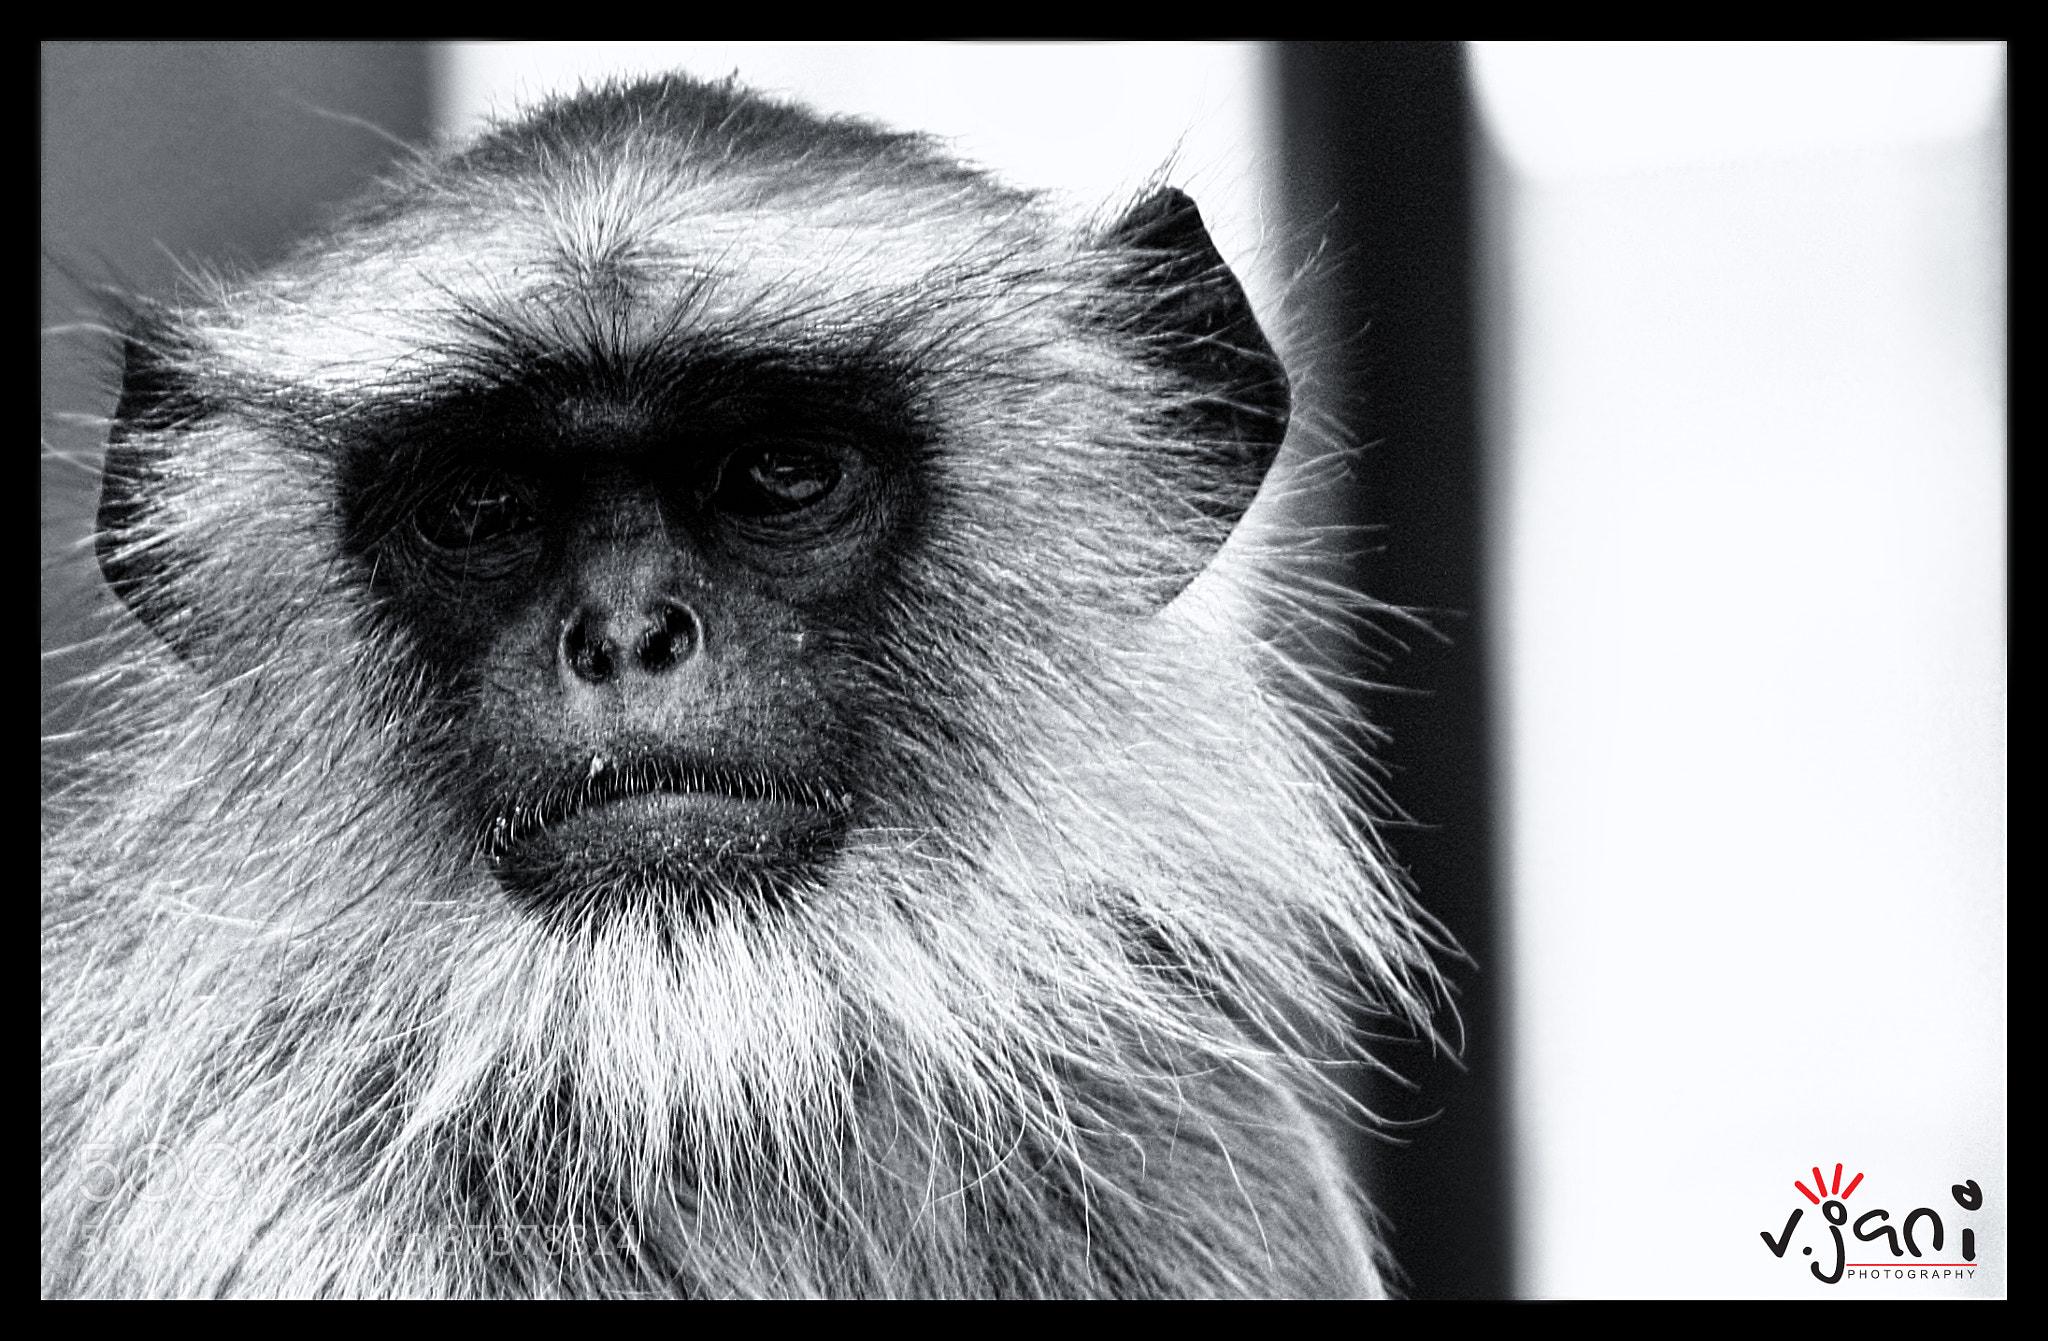 Photograph The street Monkey by vishal jani on 500px